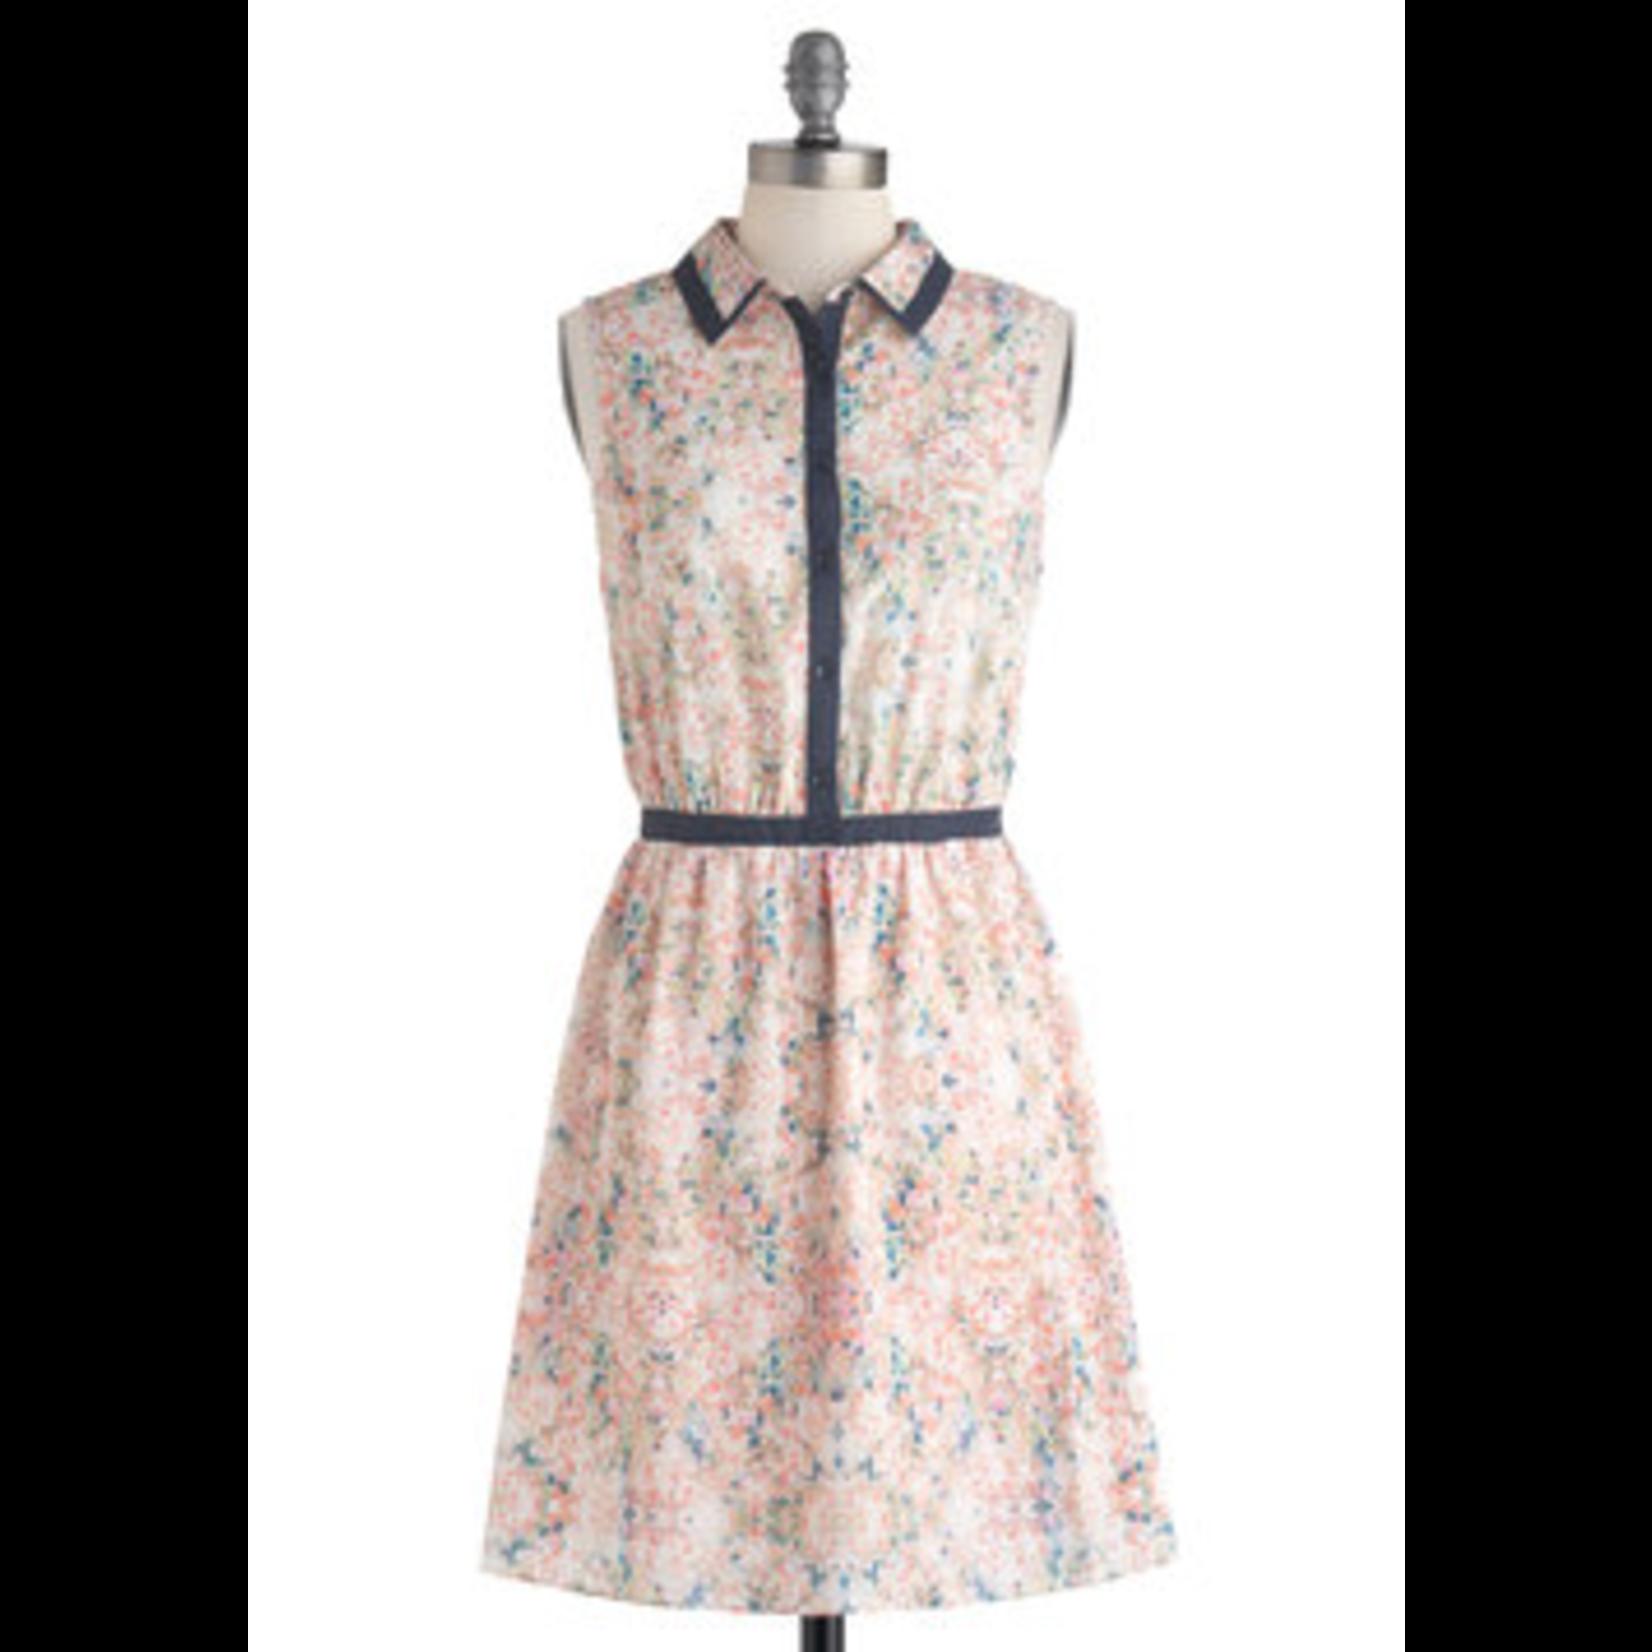 Gentle Fawn Gentle Fawn Tundra Dress